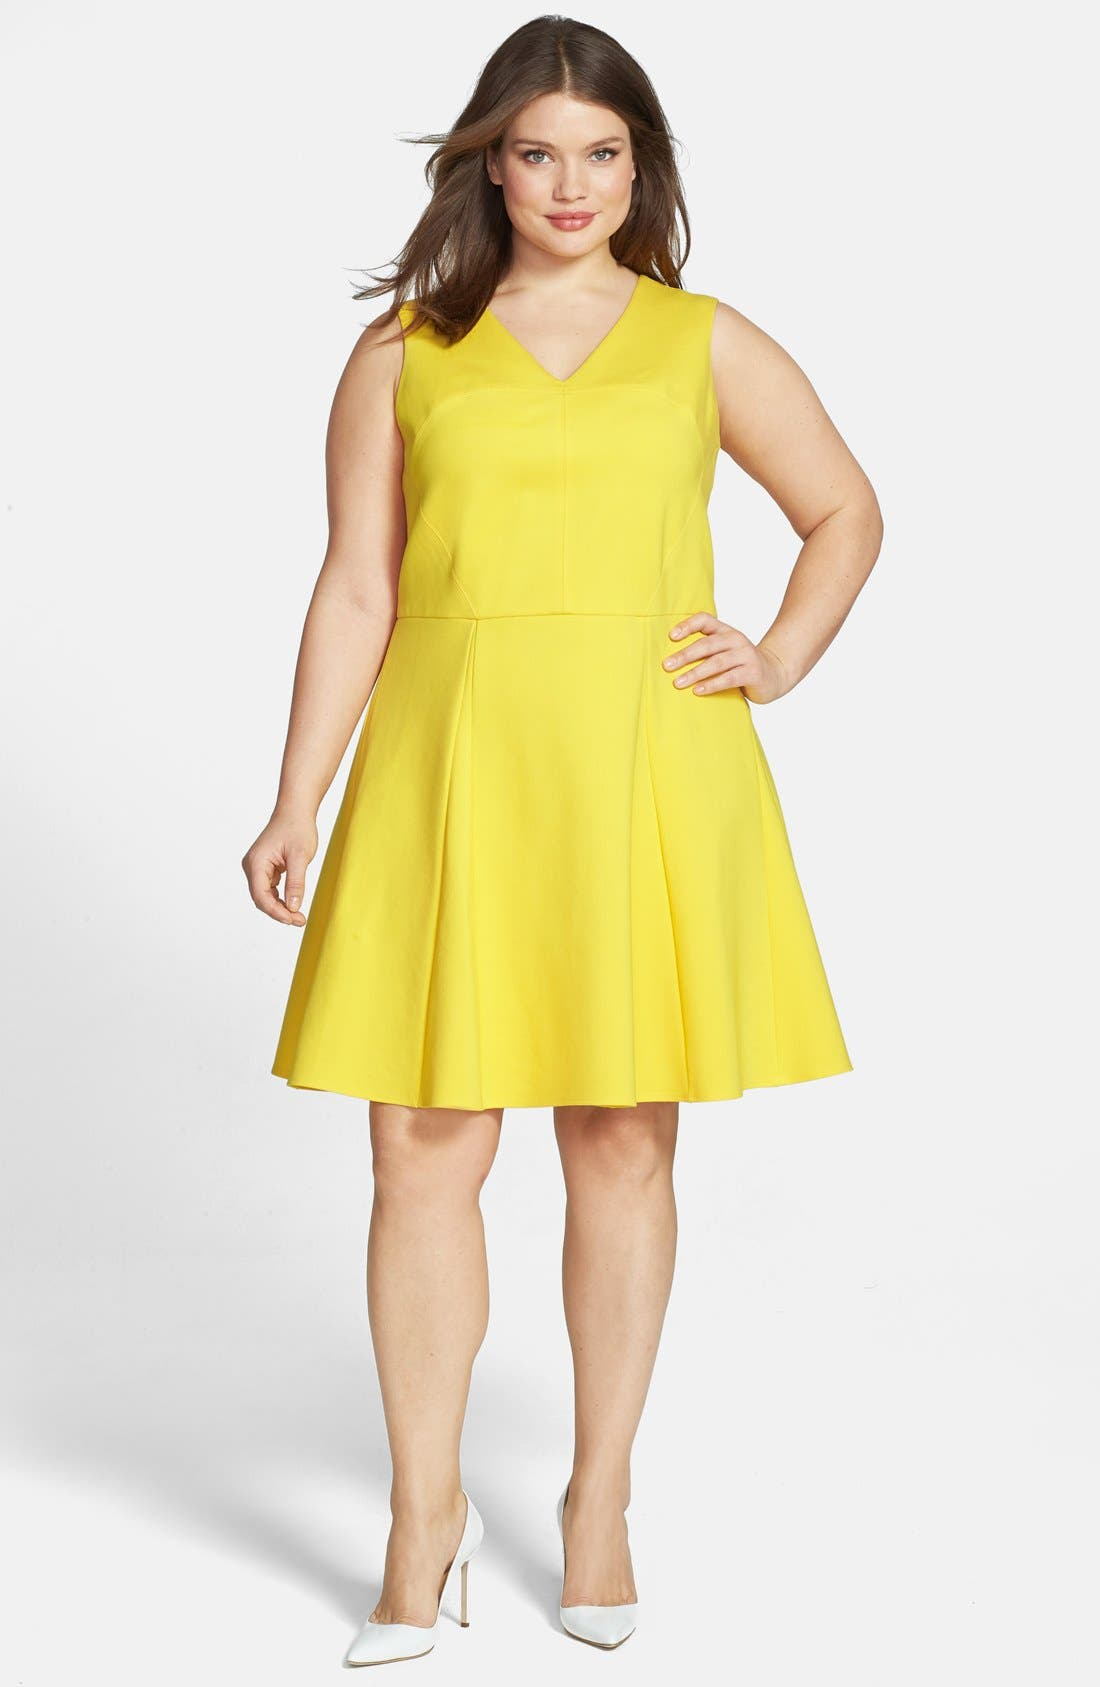 Main Image - ABS by Allen Schwartz Sleeveless Fit & Flare Dress (Plus Size)